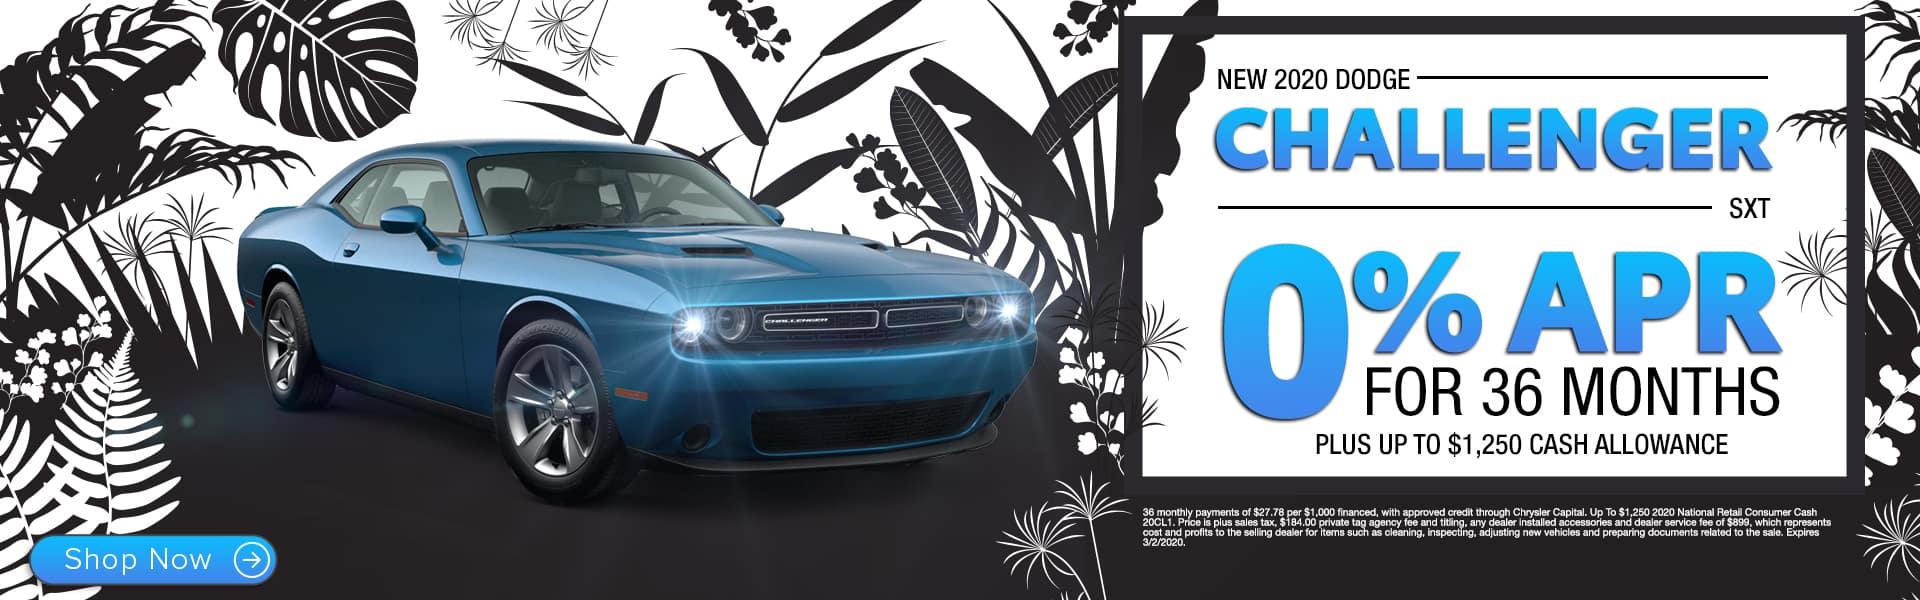 New 2020 Dodge Challenger SXT | 0% APR For 36 Months Plus Up To $1,250 Cash Allowance